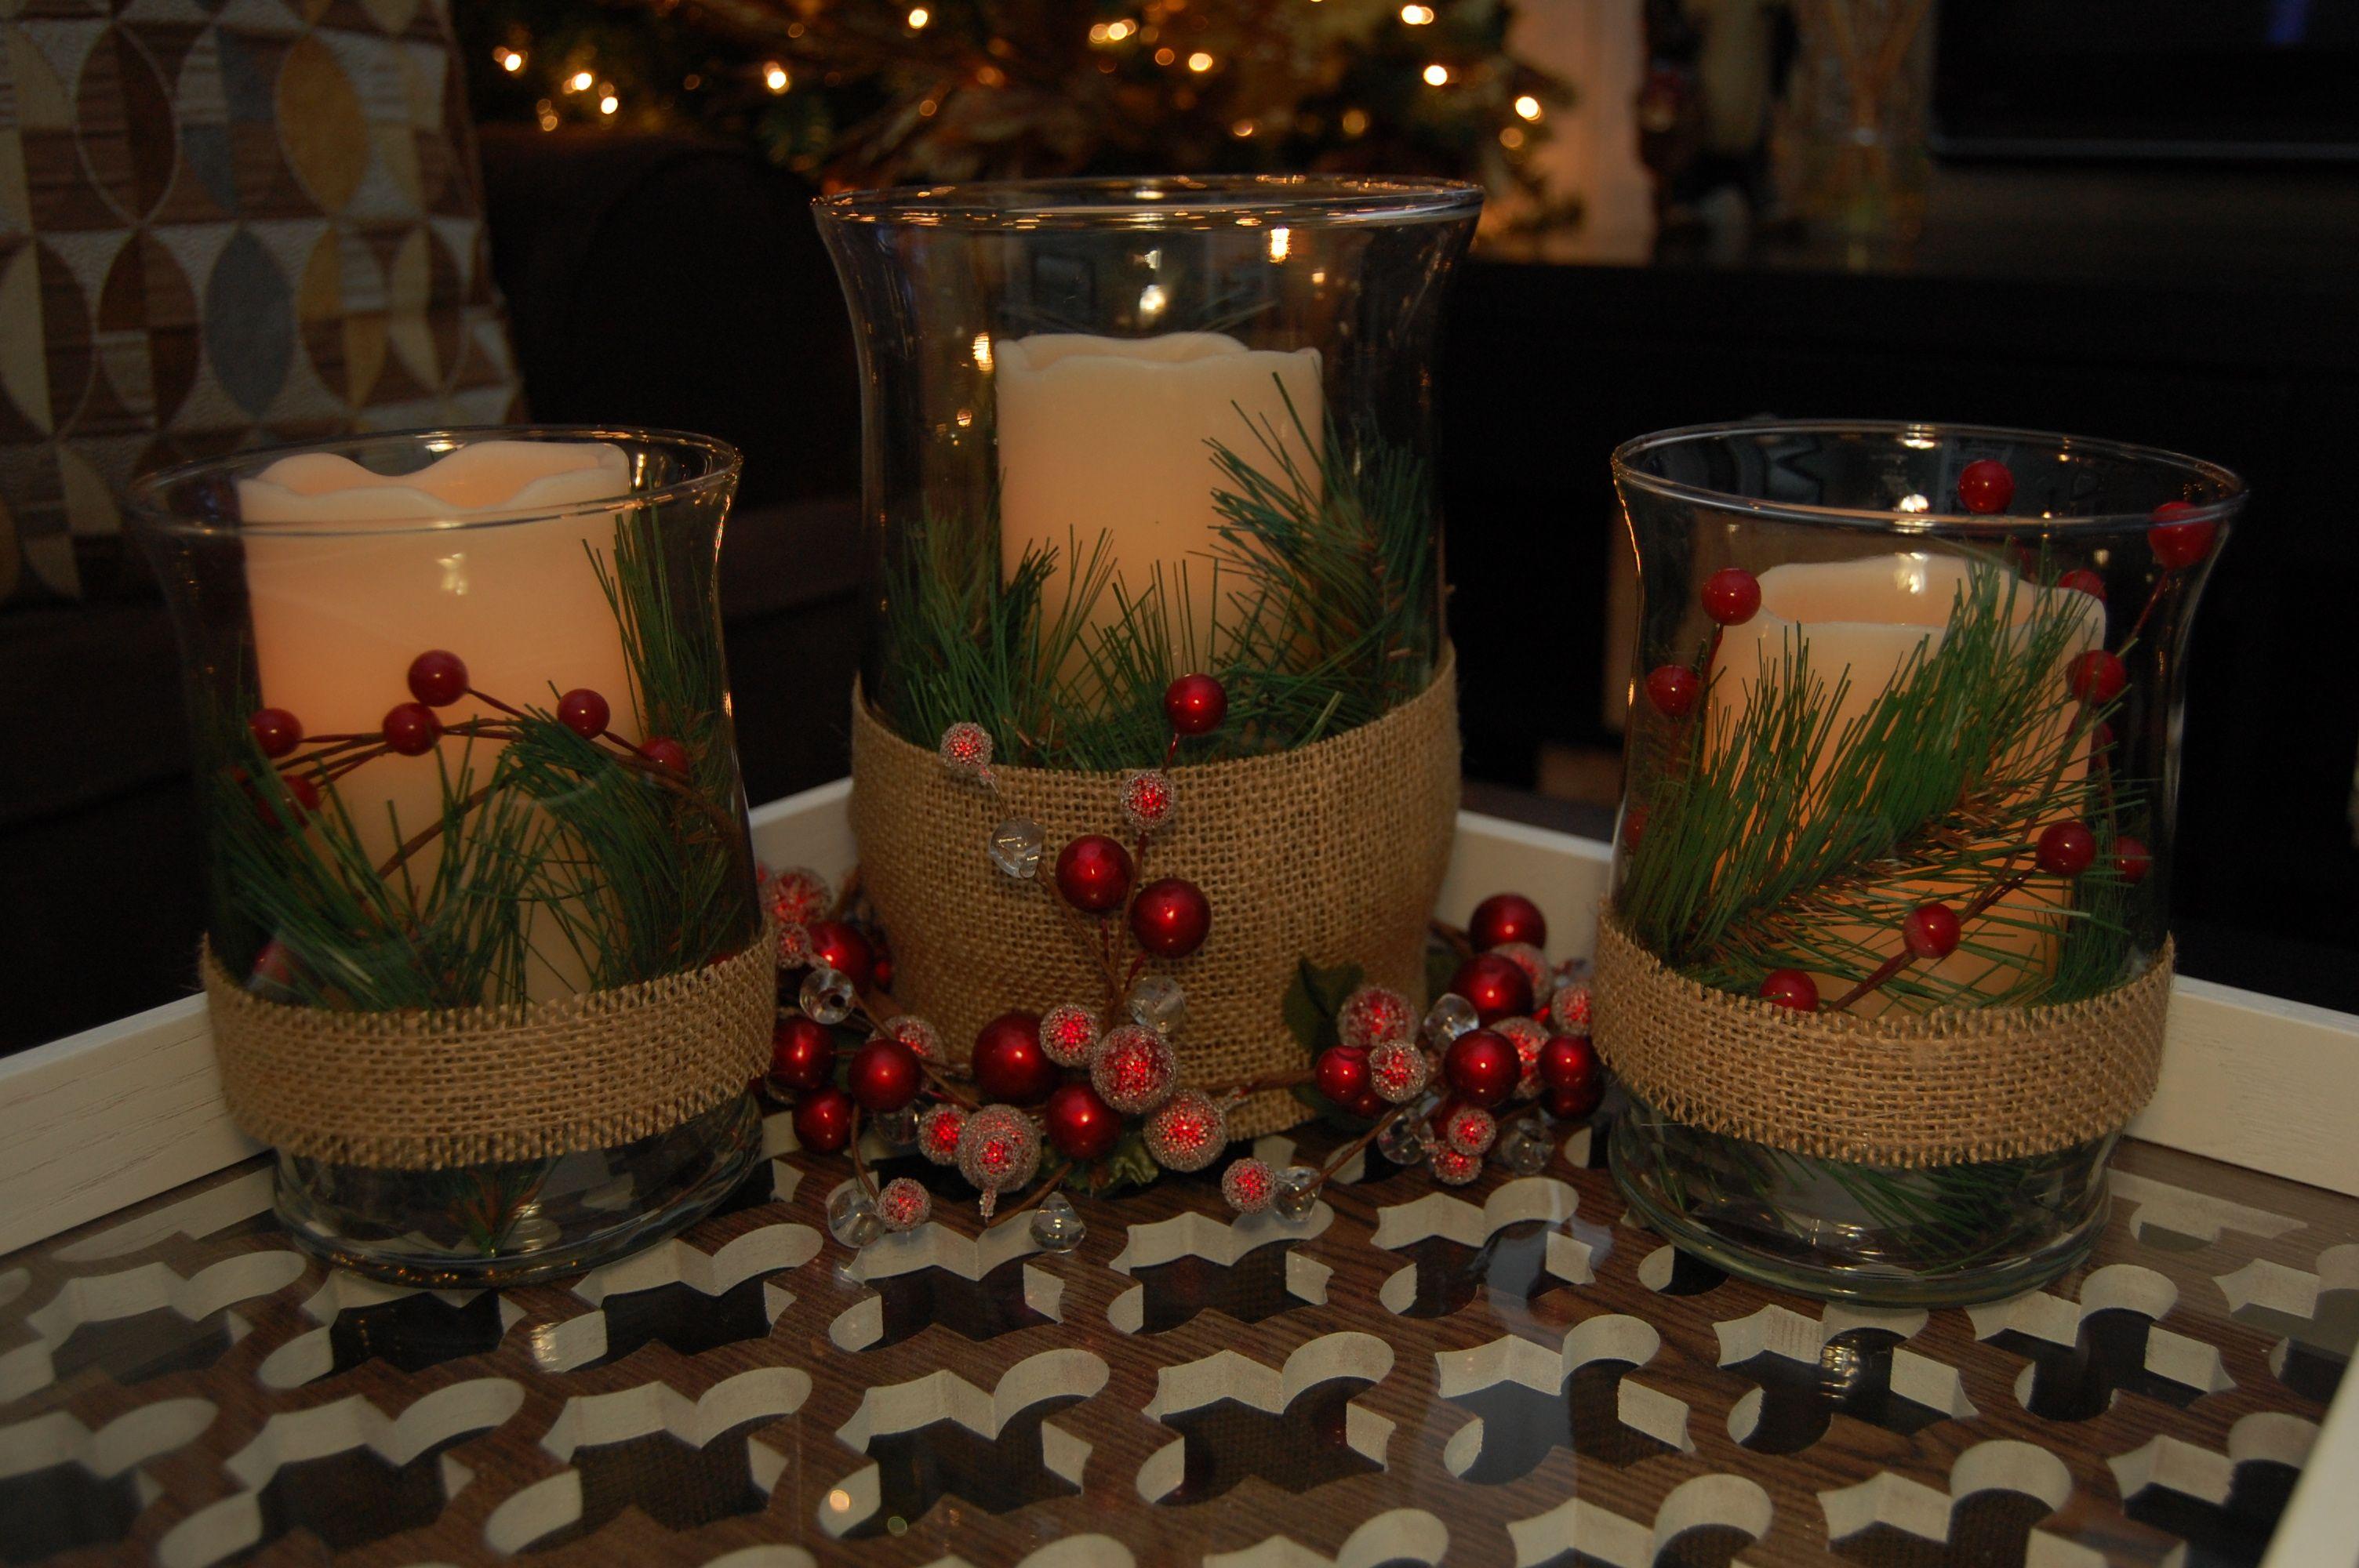 Christmas Candle Centerpiece Christmas Centers Christmas Candle Centerpieces Christmas Centerpieces